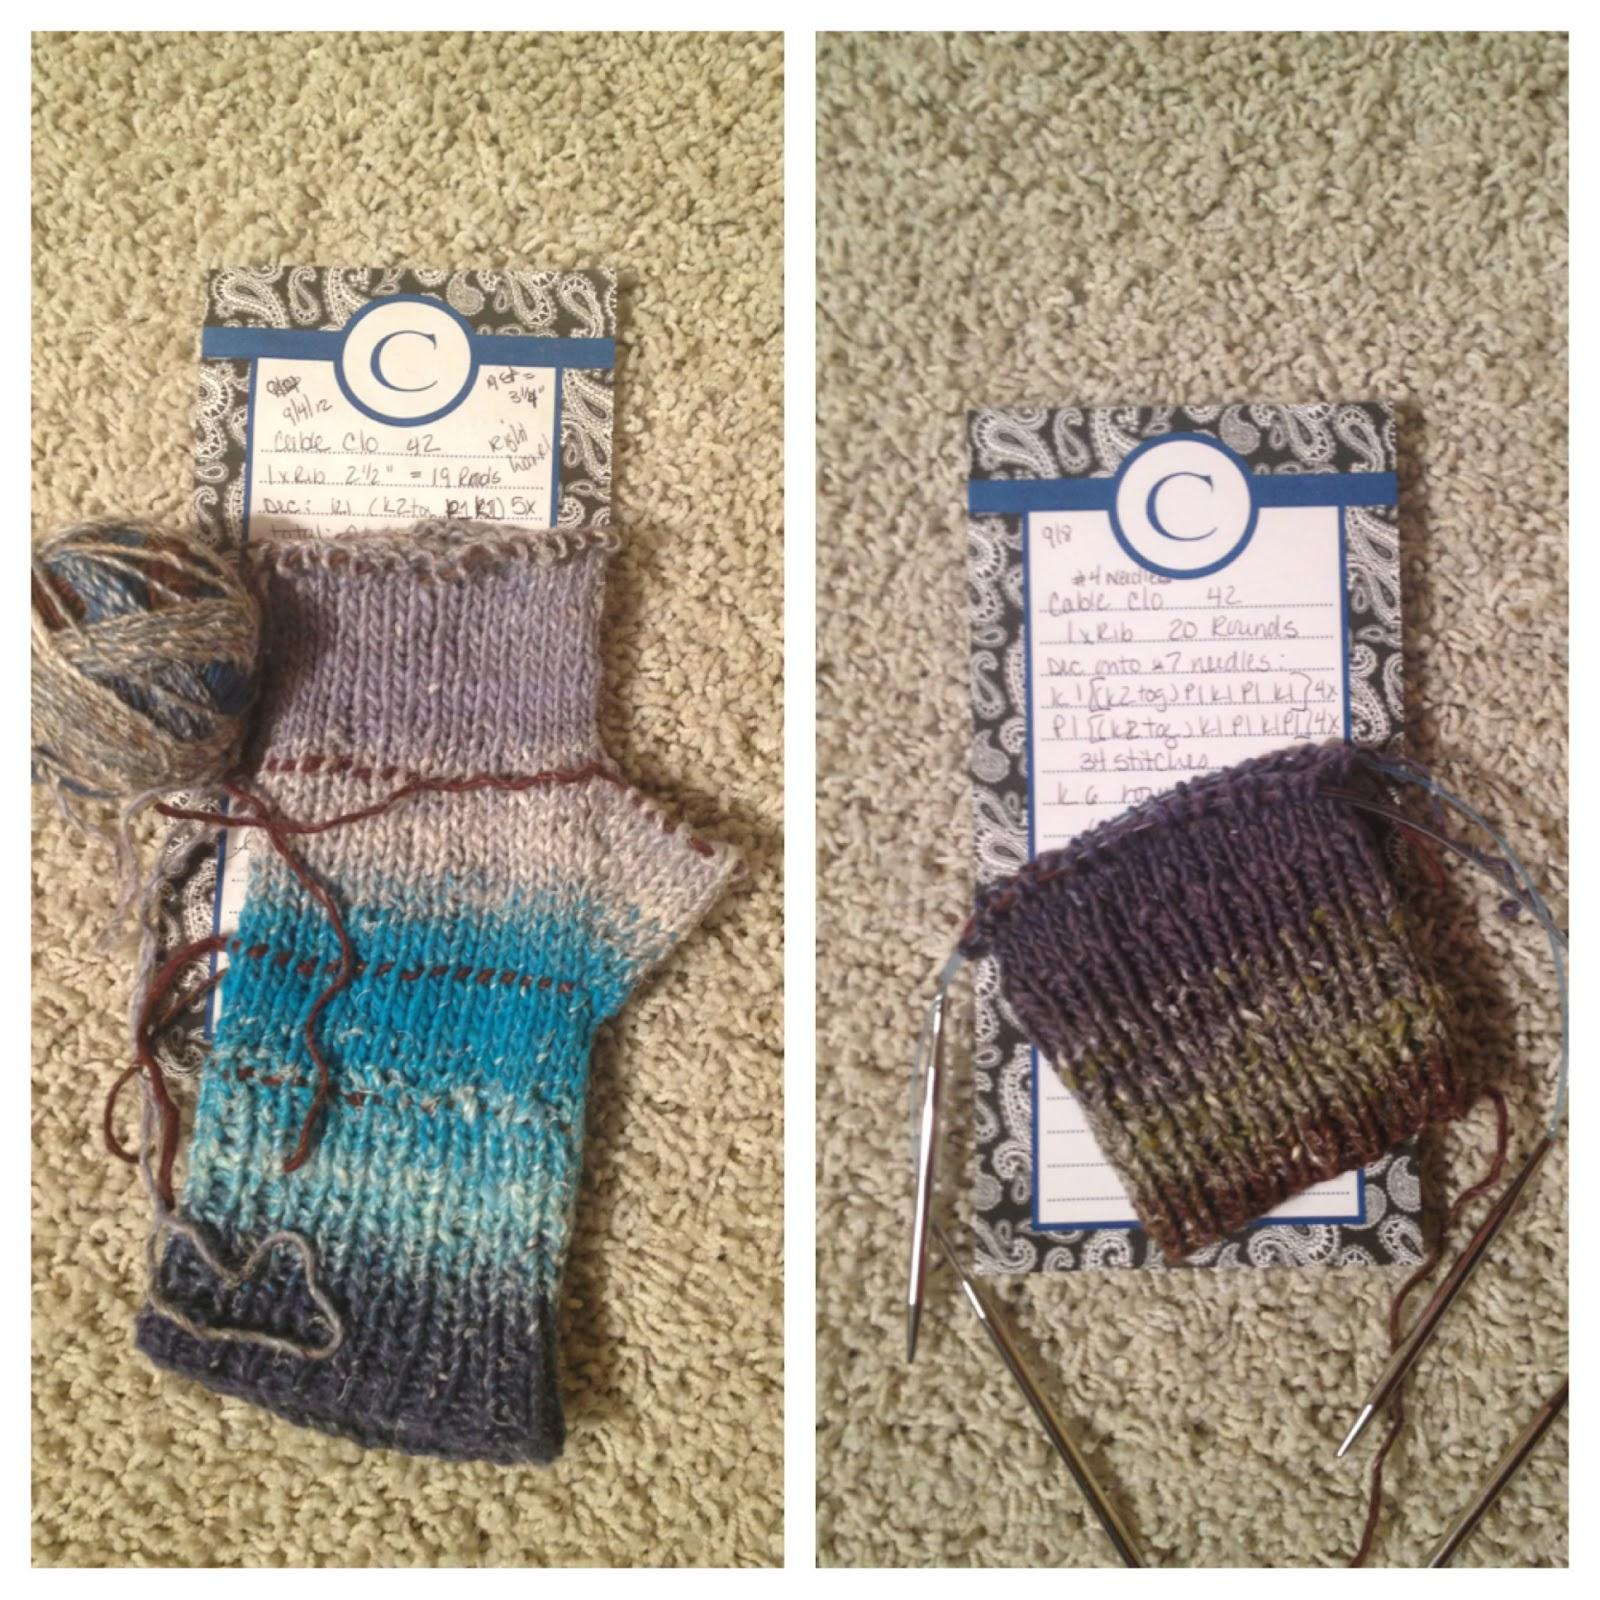 ChristinaPurls...: Can You Bring Knitting Needles to a Major League Baseball ...